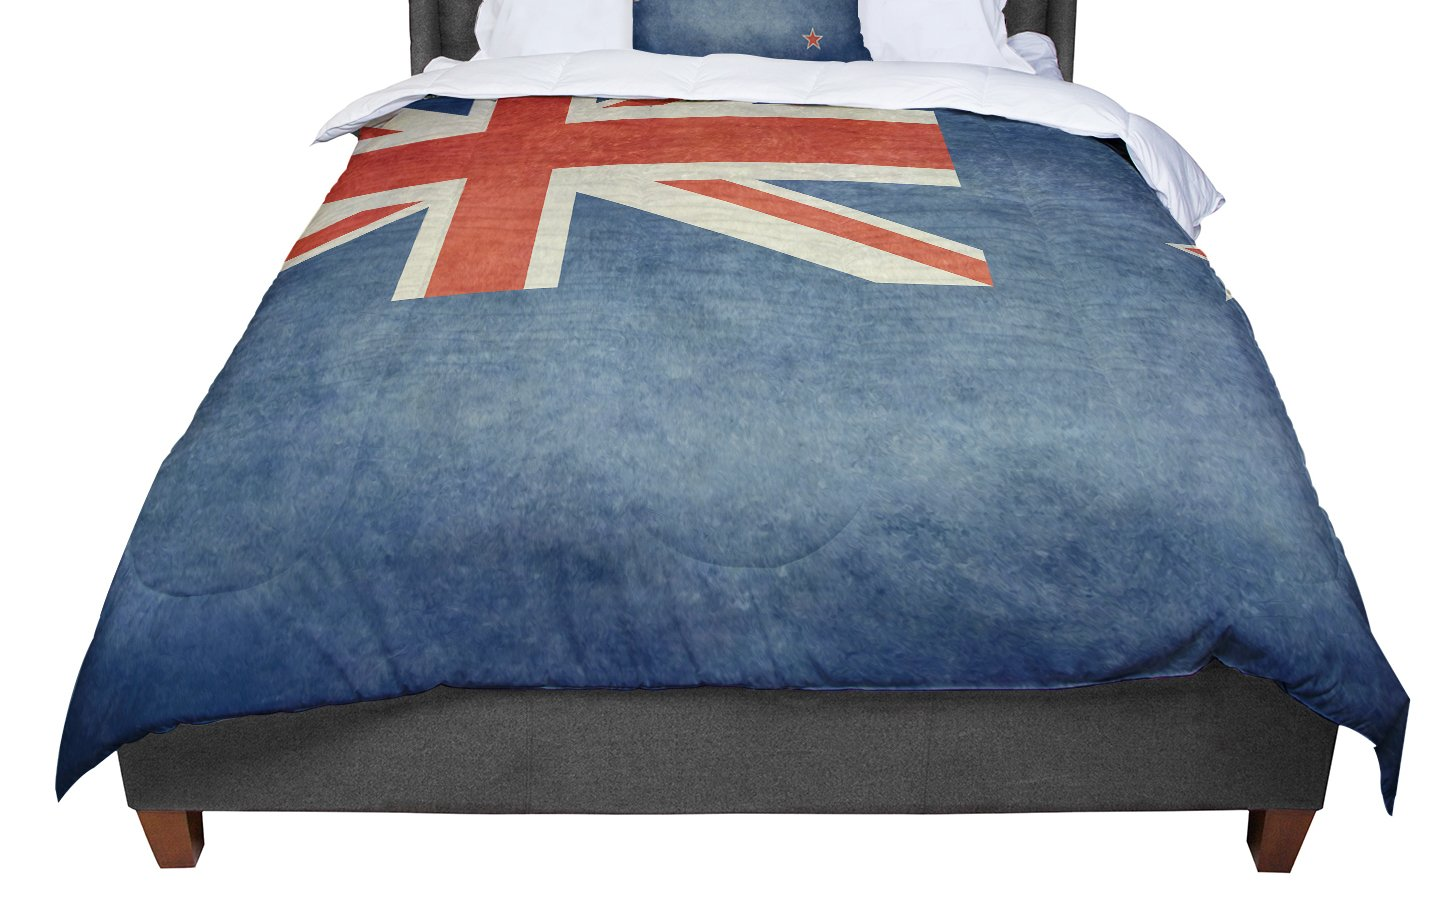 KESS InHouse Bruce Stanfield Flag of New Zealand Blue Twin Comforter 68 X 88